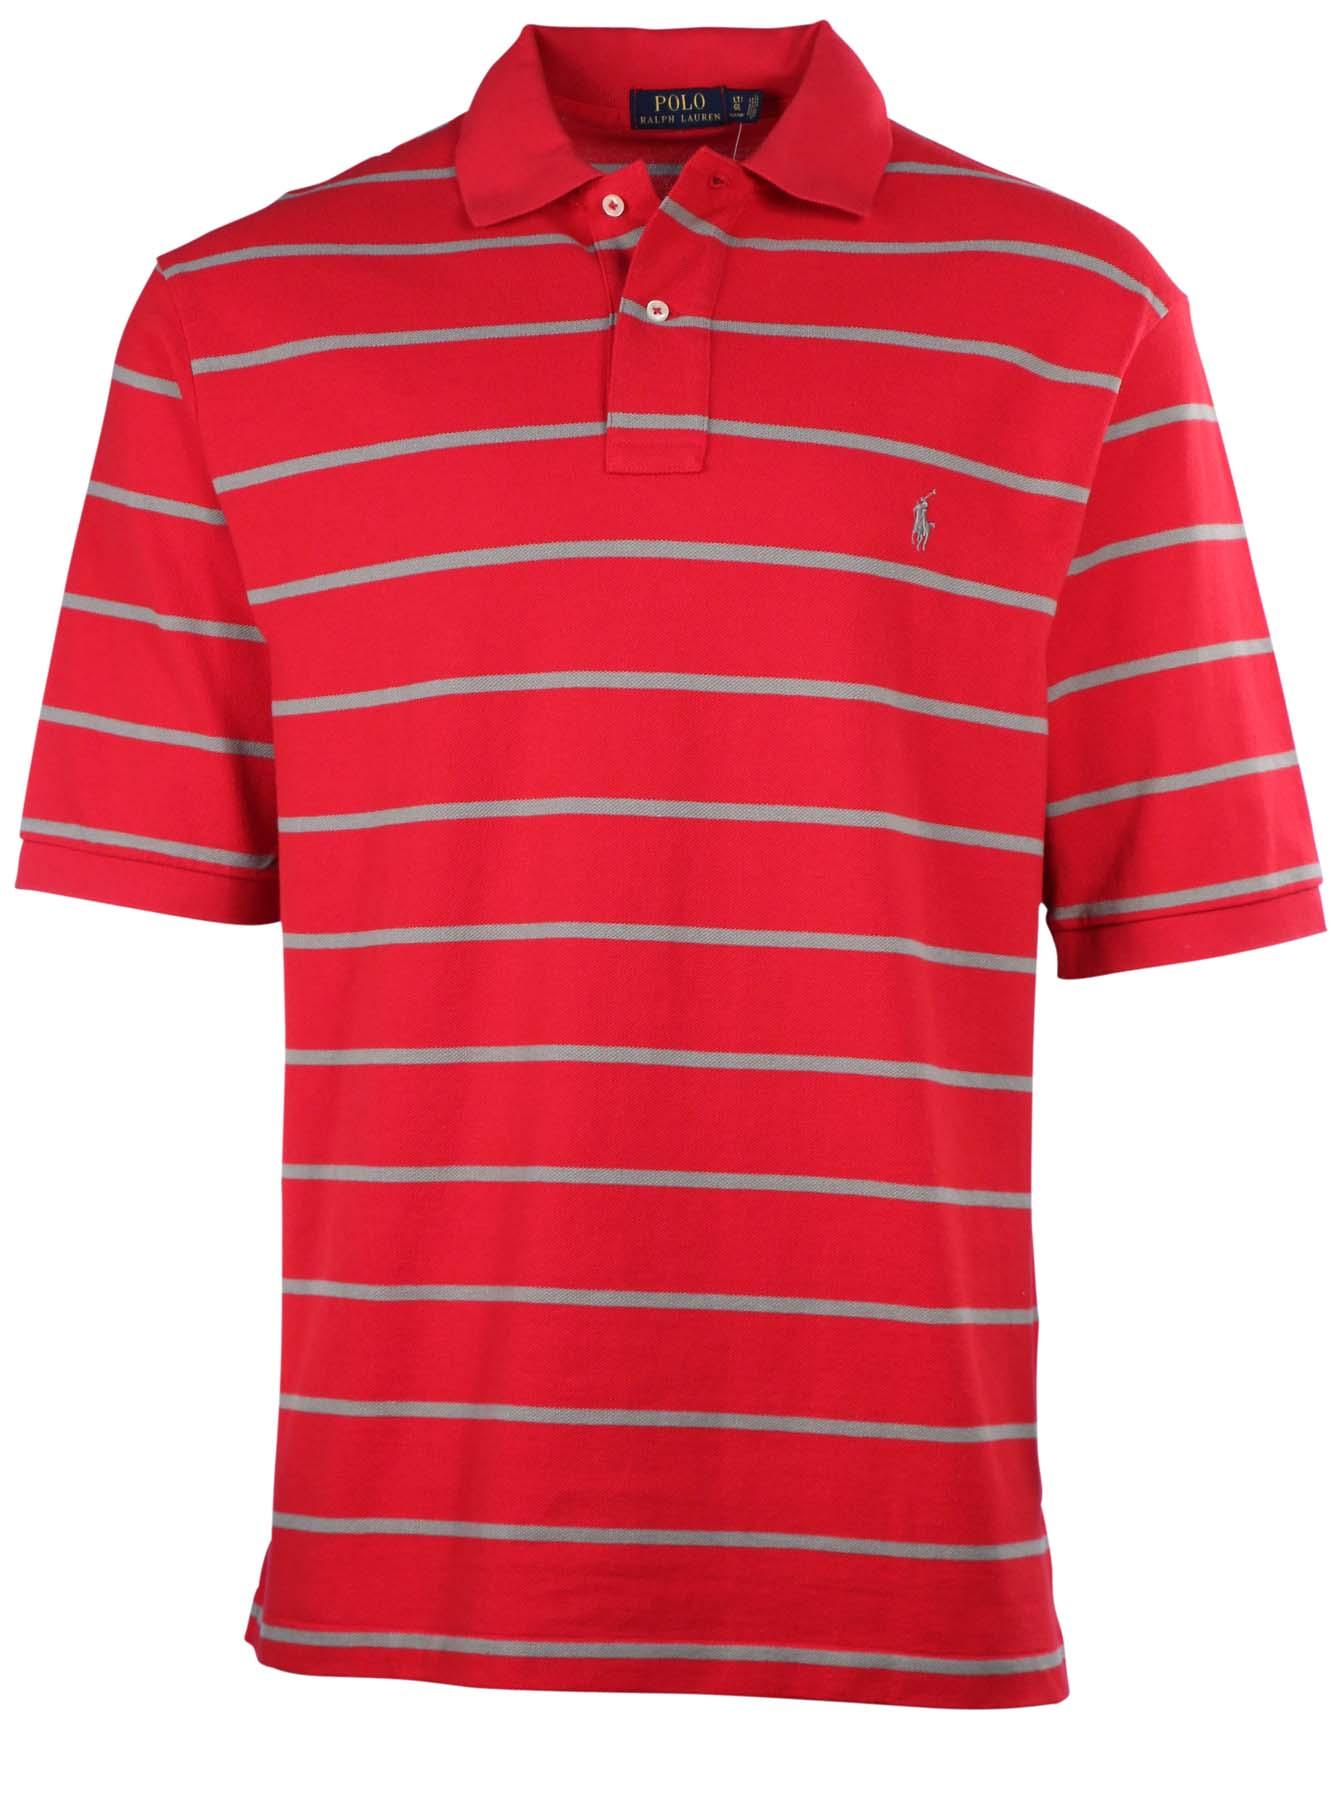 Polo ralph lauren men 39 s big tall mesh stripe polo shirt ebay for Big size polo shirts